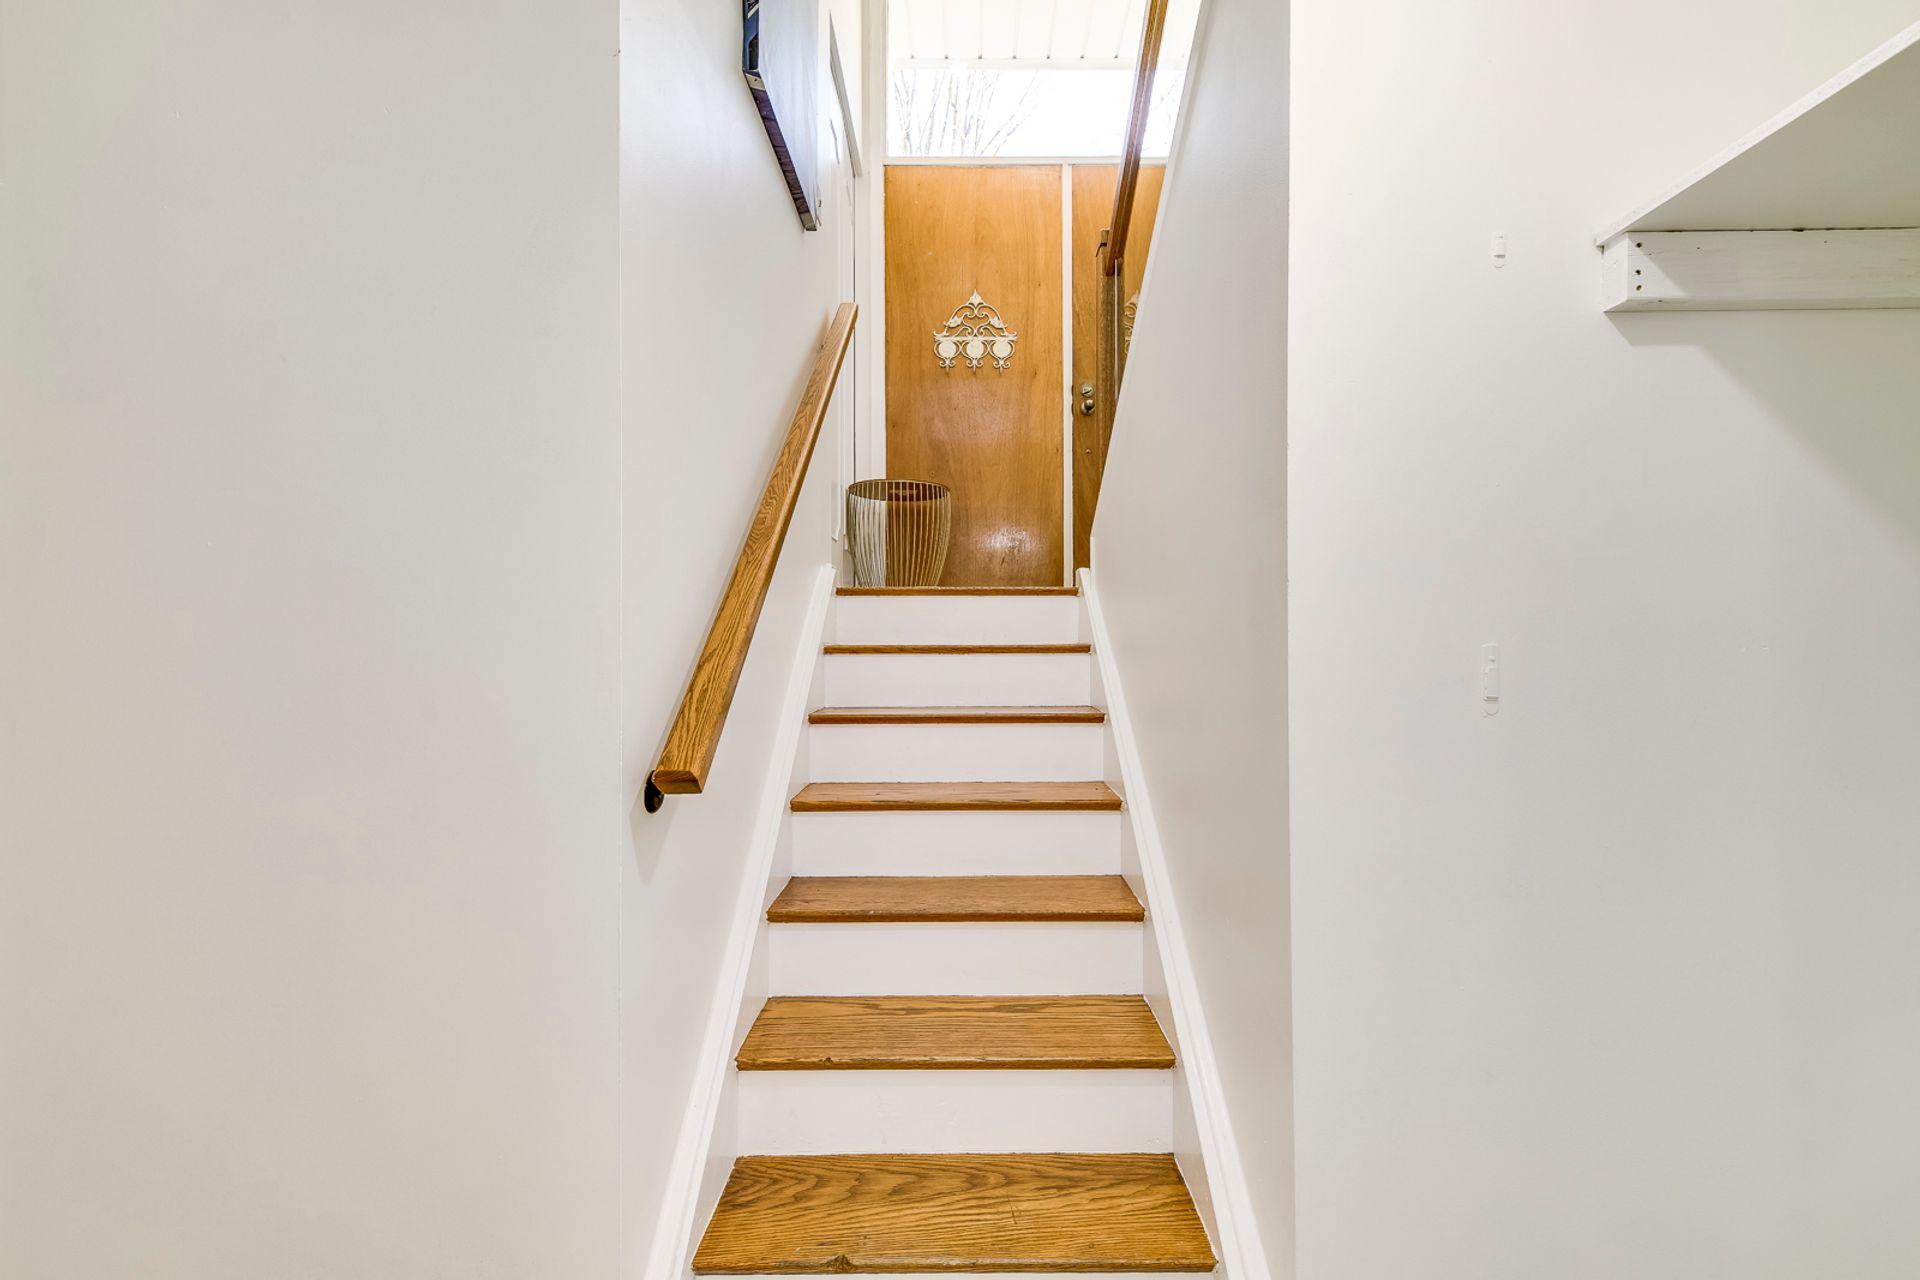 Stairs -1247 Kensington Park Rd, Oakville - Elite3 & Team at 1247 Kensington Park Road, Iroquois Ridge South, Oakville